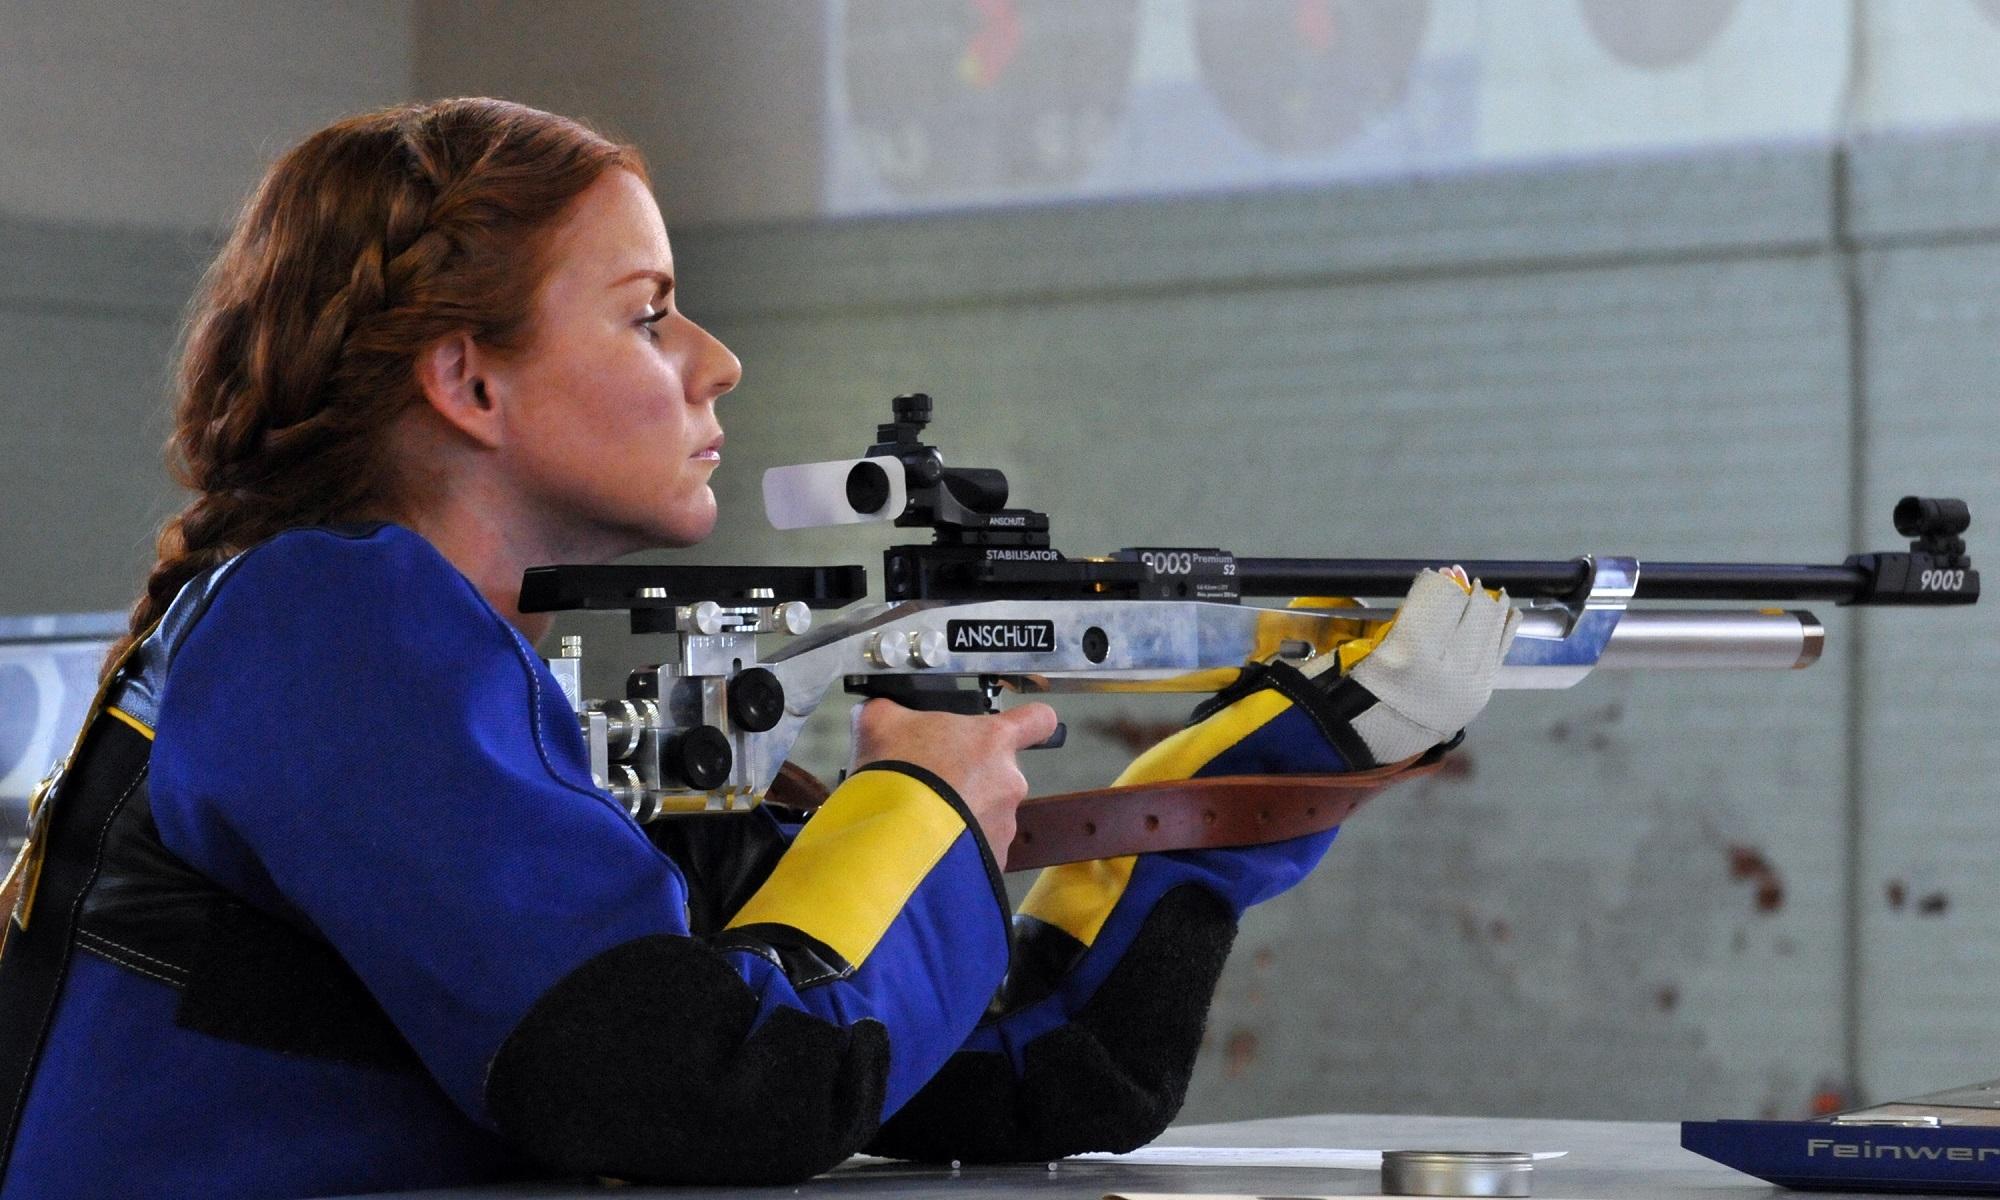 c0f412d04b56a woman sport range recreation female weapon competition shooting sports gun  shoot rifle games target aim shooter